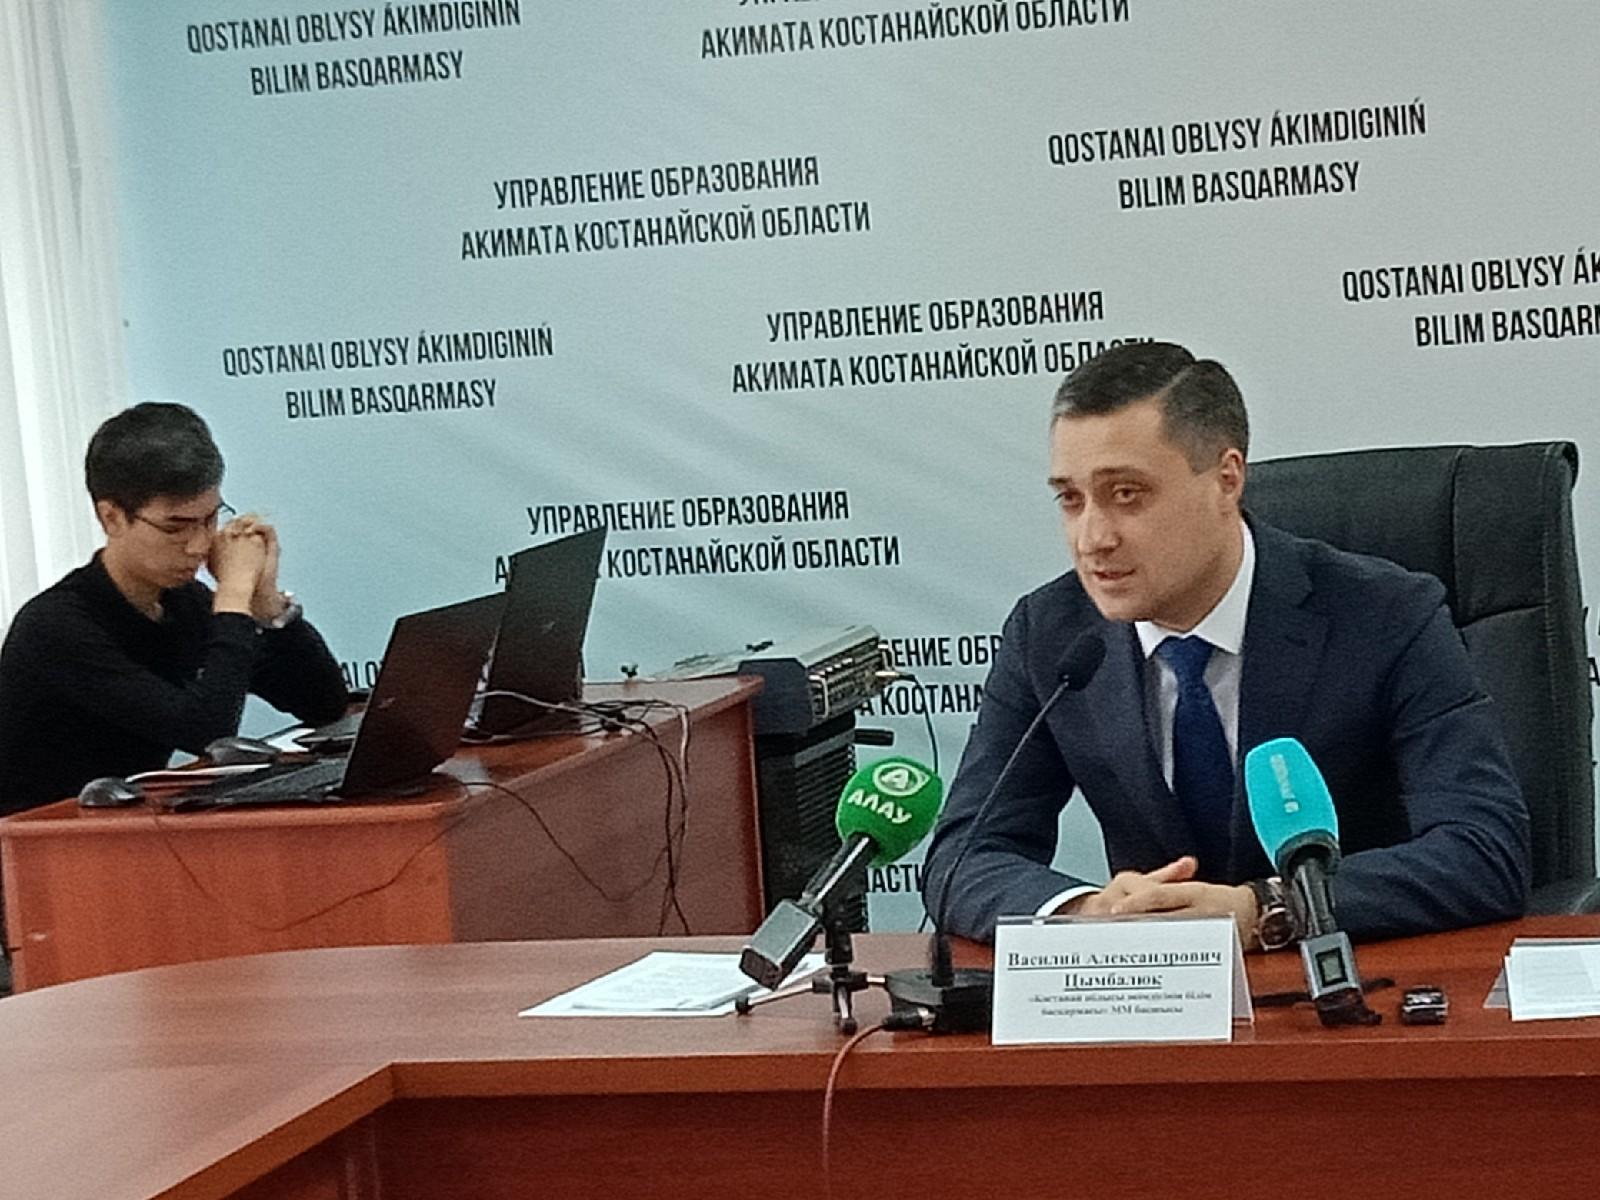 Работа в костанае онлайн курс доллара форекс на сегодня в москве